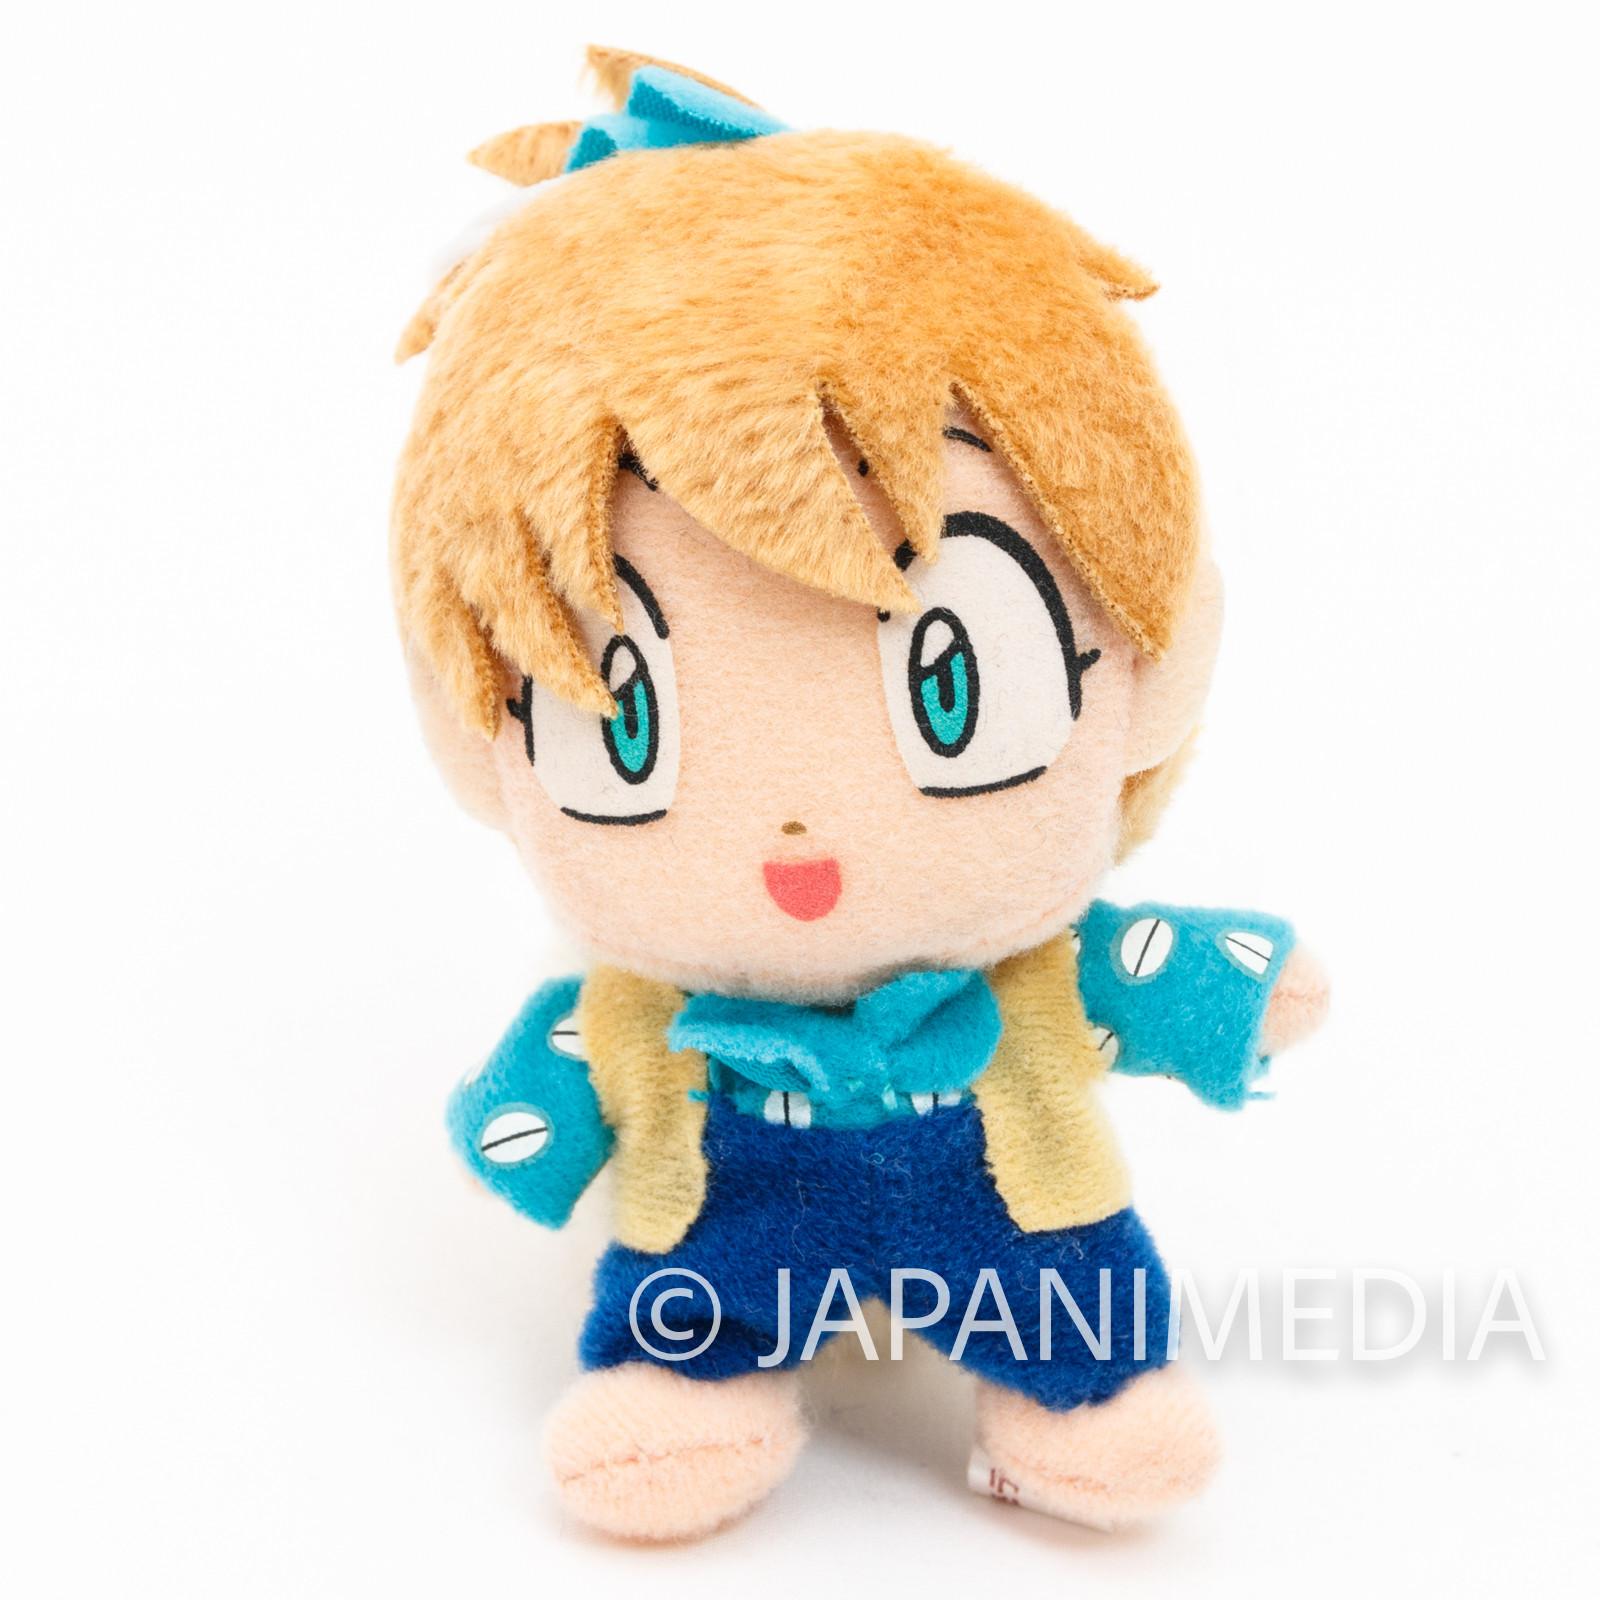 "RARE!! InuYasha Shippou Inuyasha Friends 3.5"" Mini Plush Doll JAPAN ANIME NO BOX"